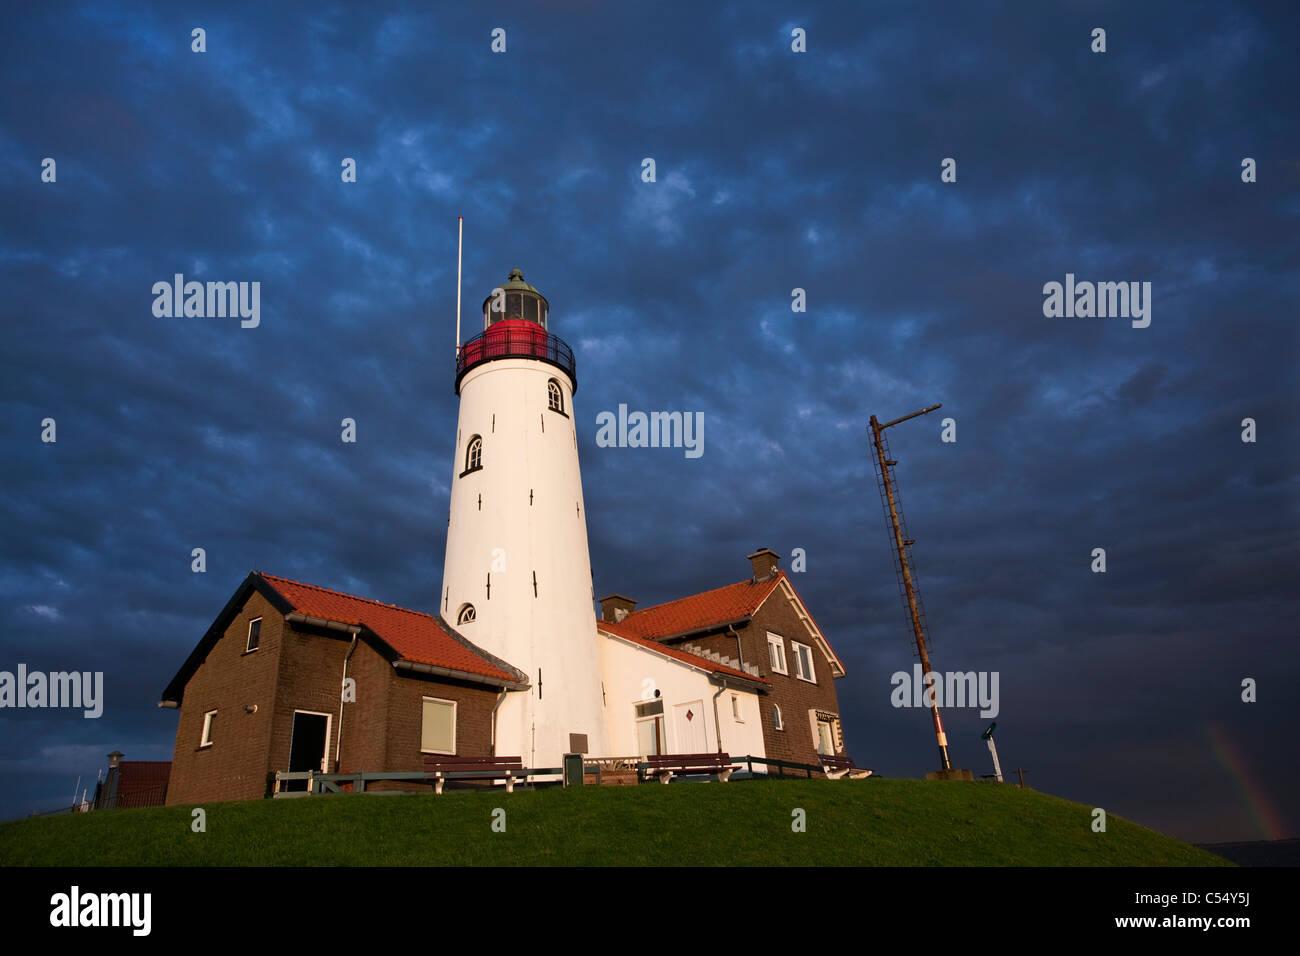 The Netherlands, Urk, Lighthouse of the fisher village, Flevopolder. - Stock Image